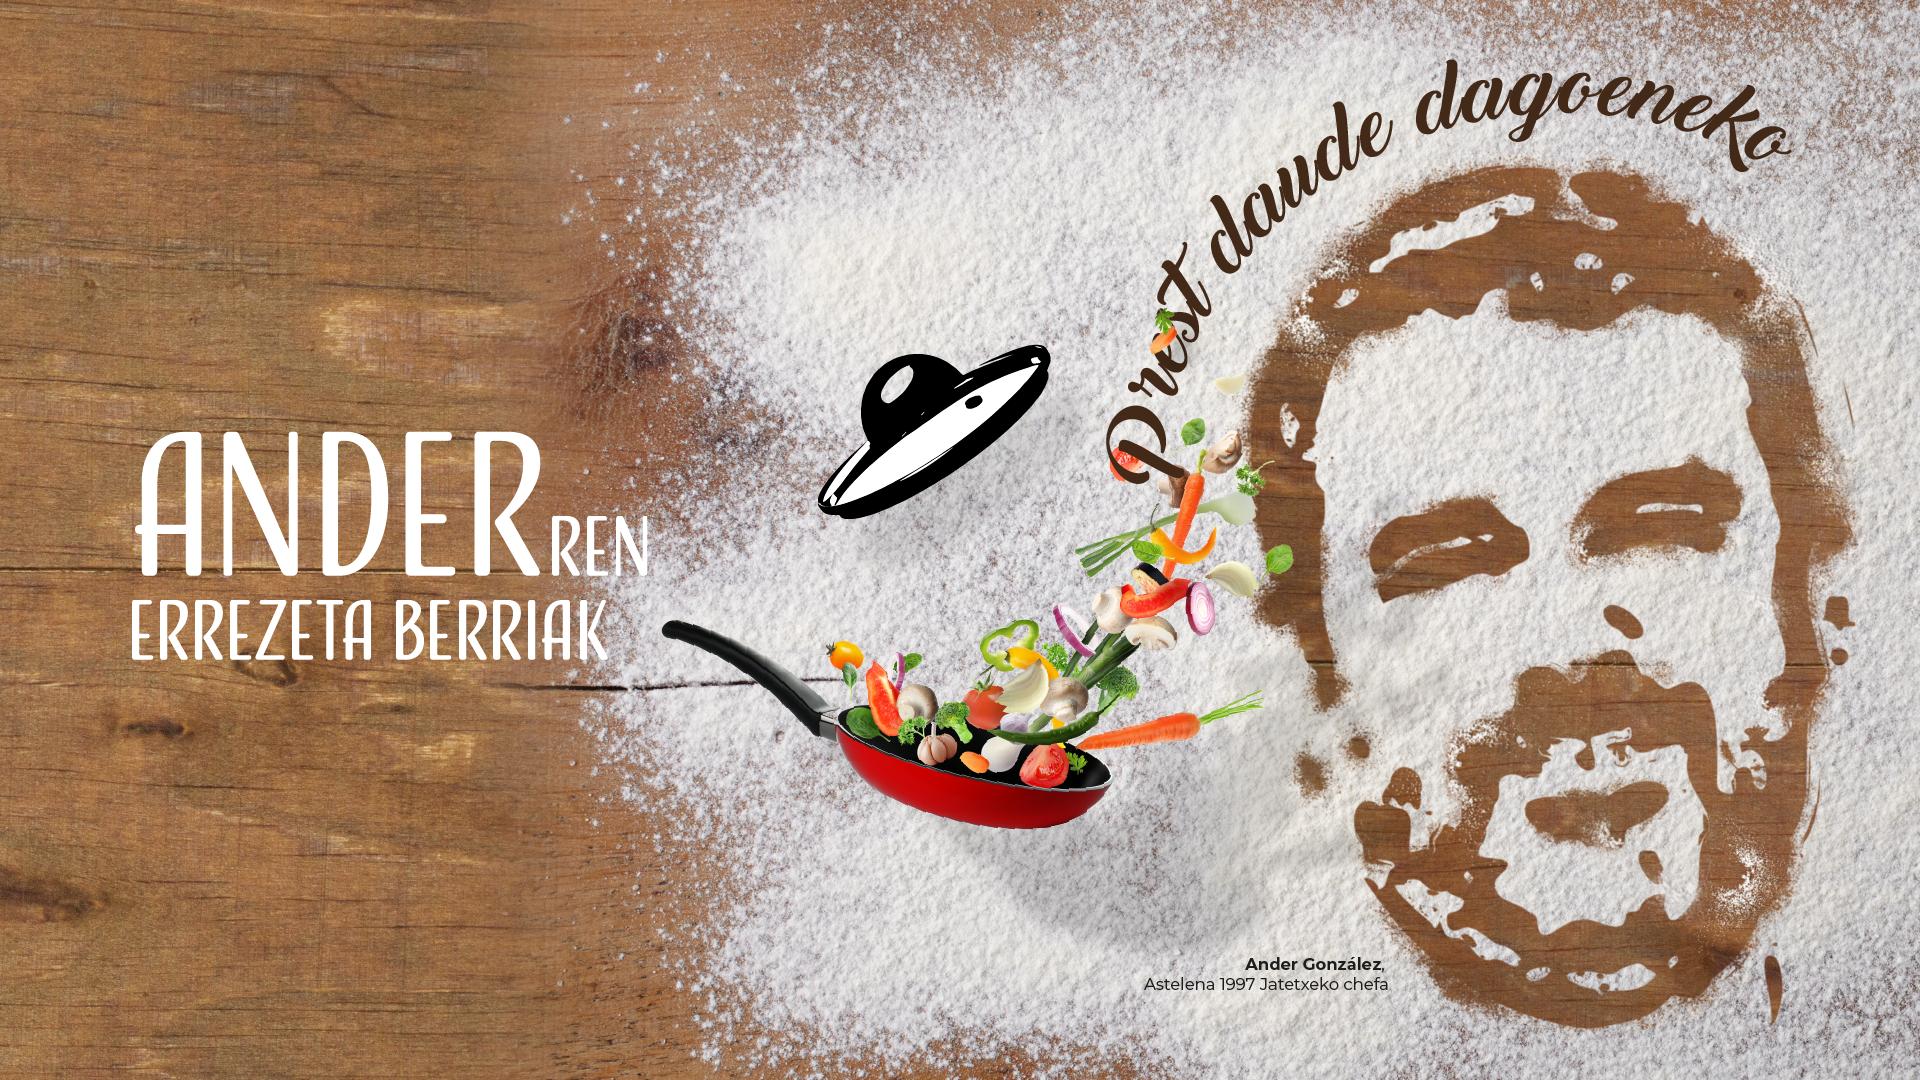 Ander-en errezeta berriak, i-Super Las nuevas recetas de Ander, i-Super de SUPER AMARA